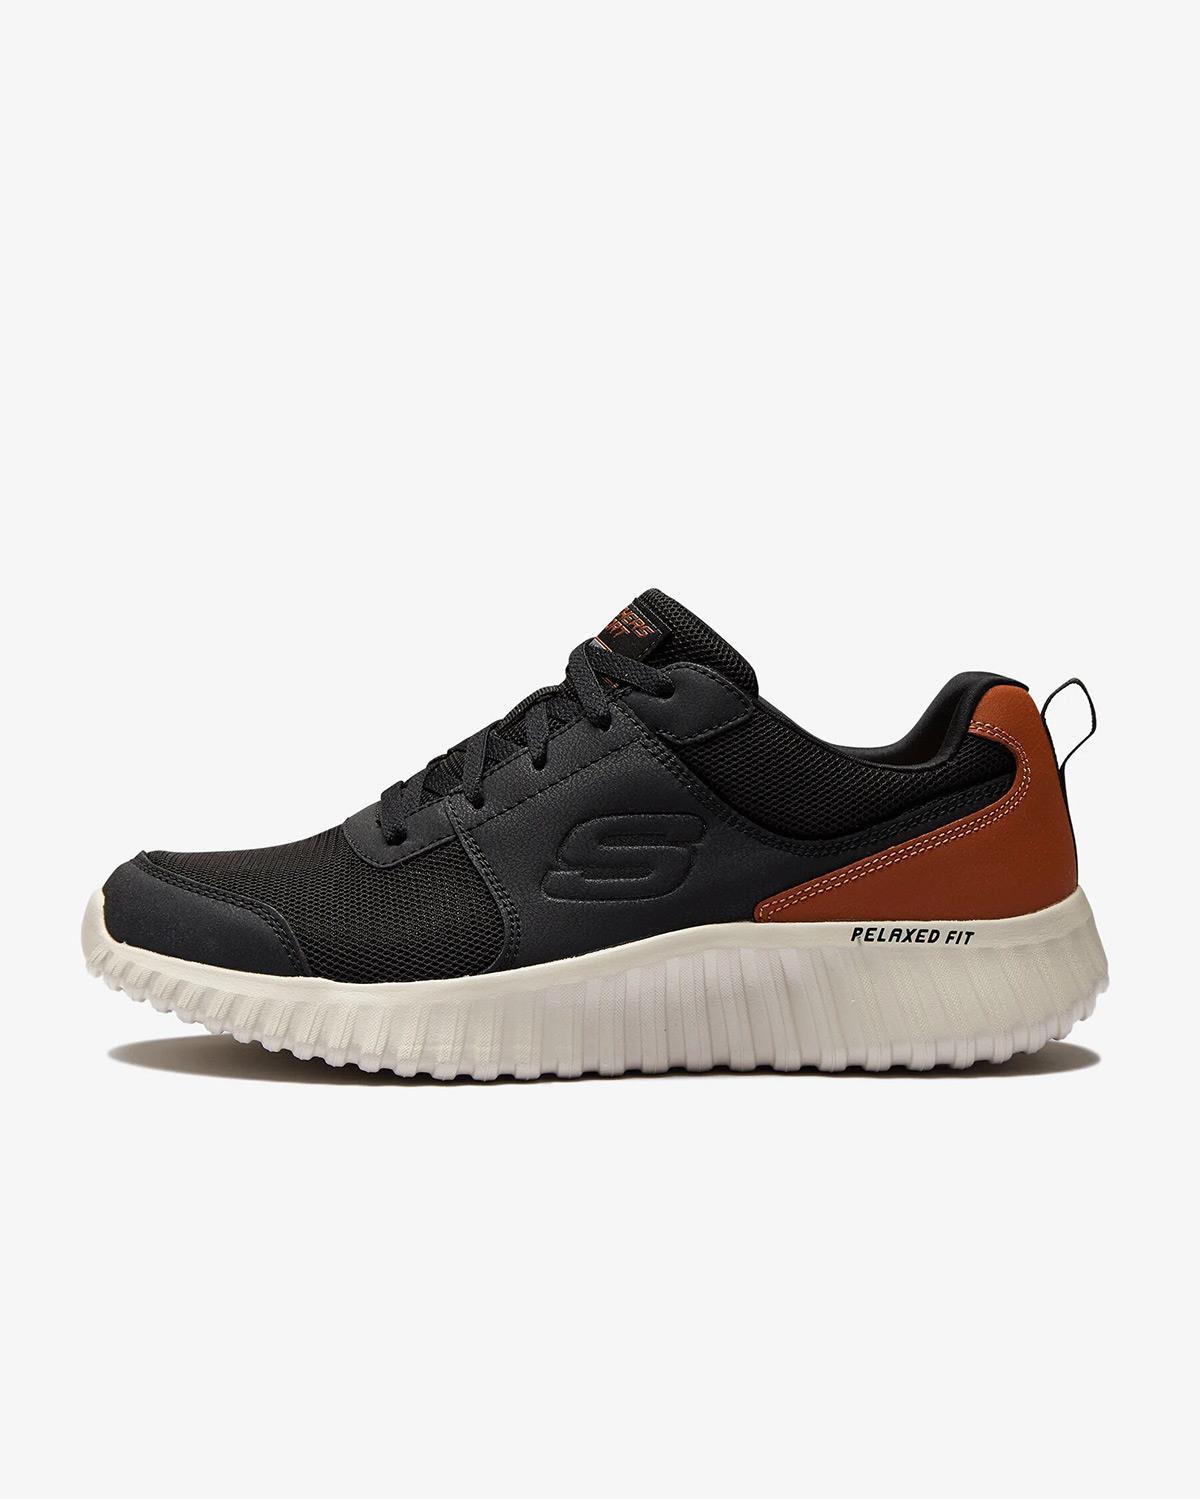 Skechers TRACK - MOULTON Erkek Ayakkabısı SKC232081 WHT